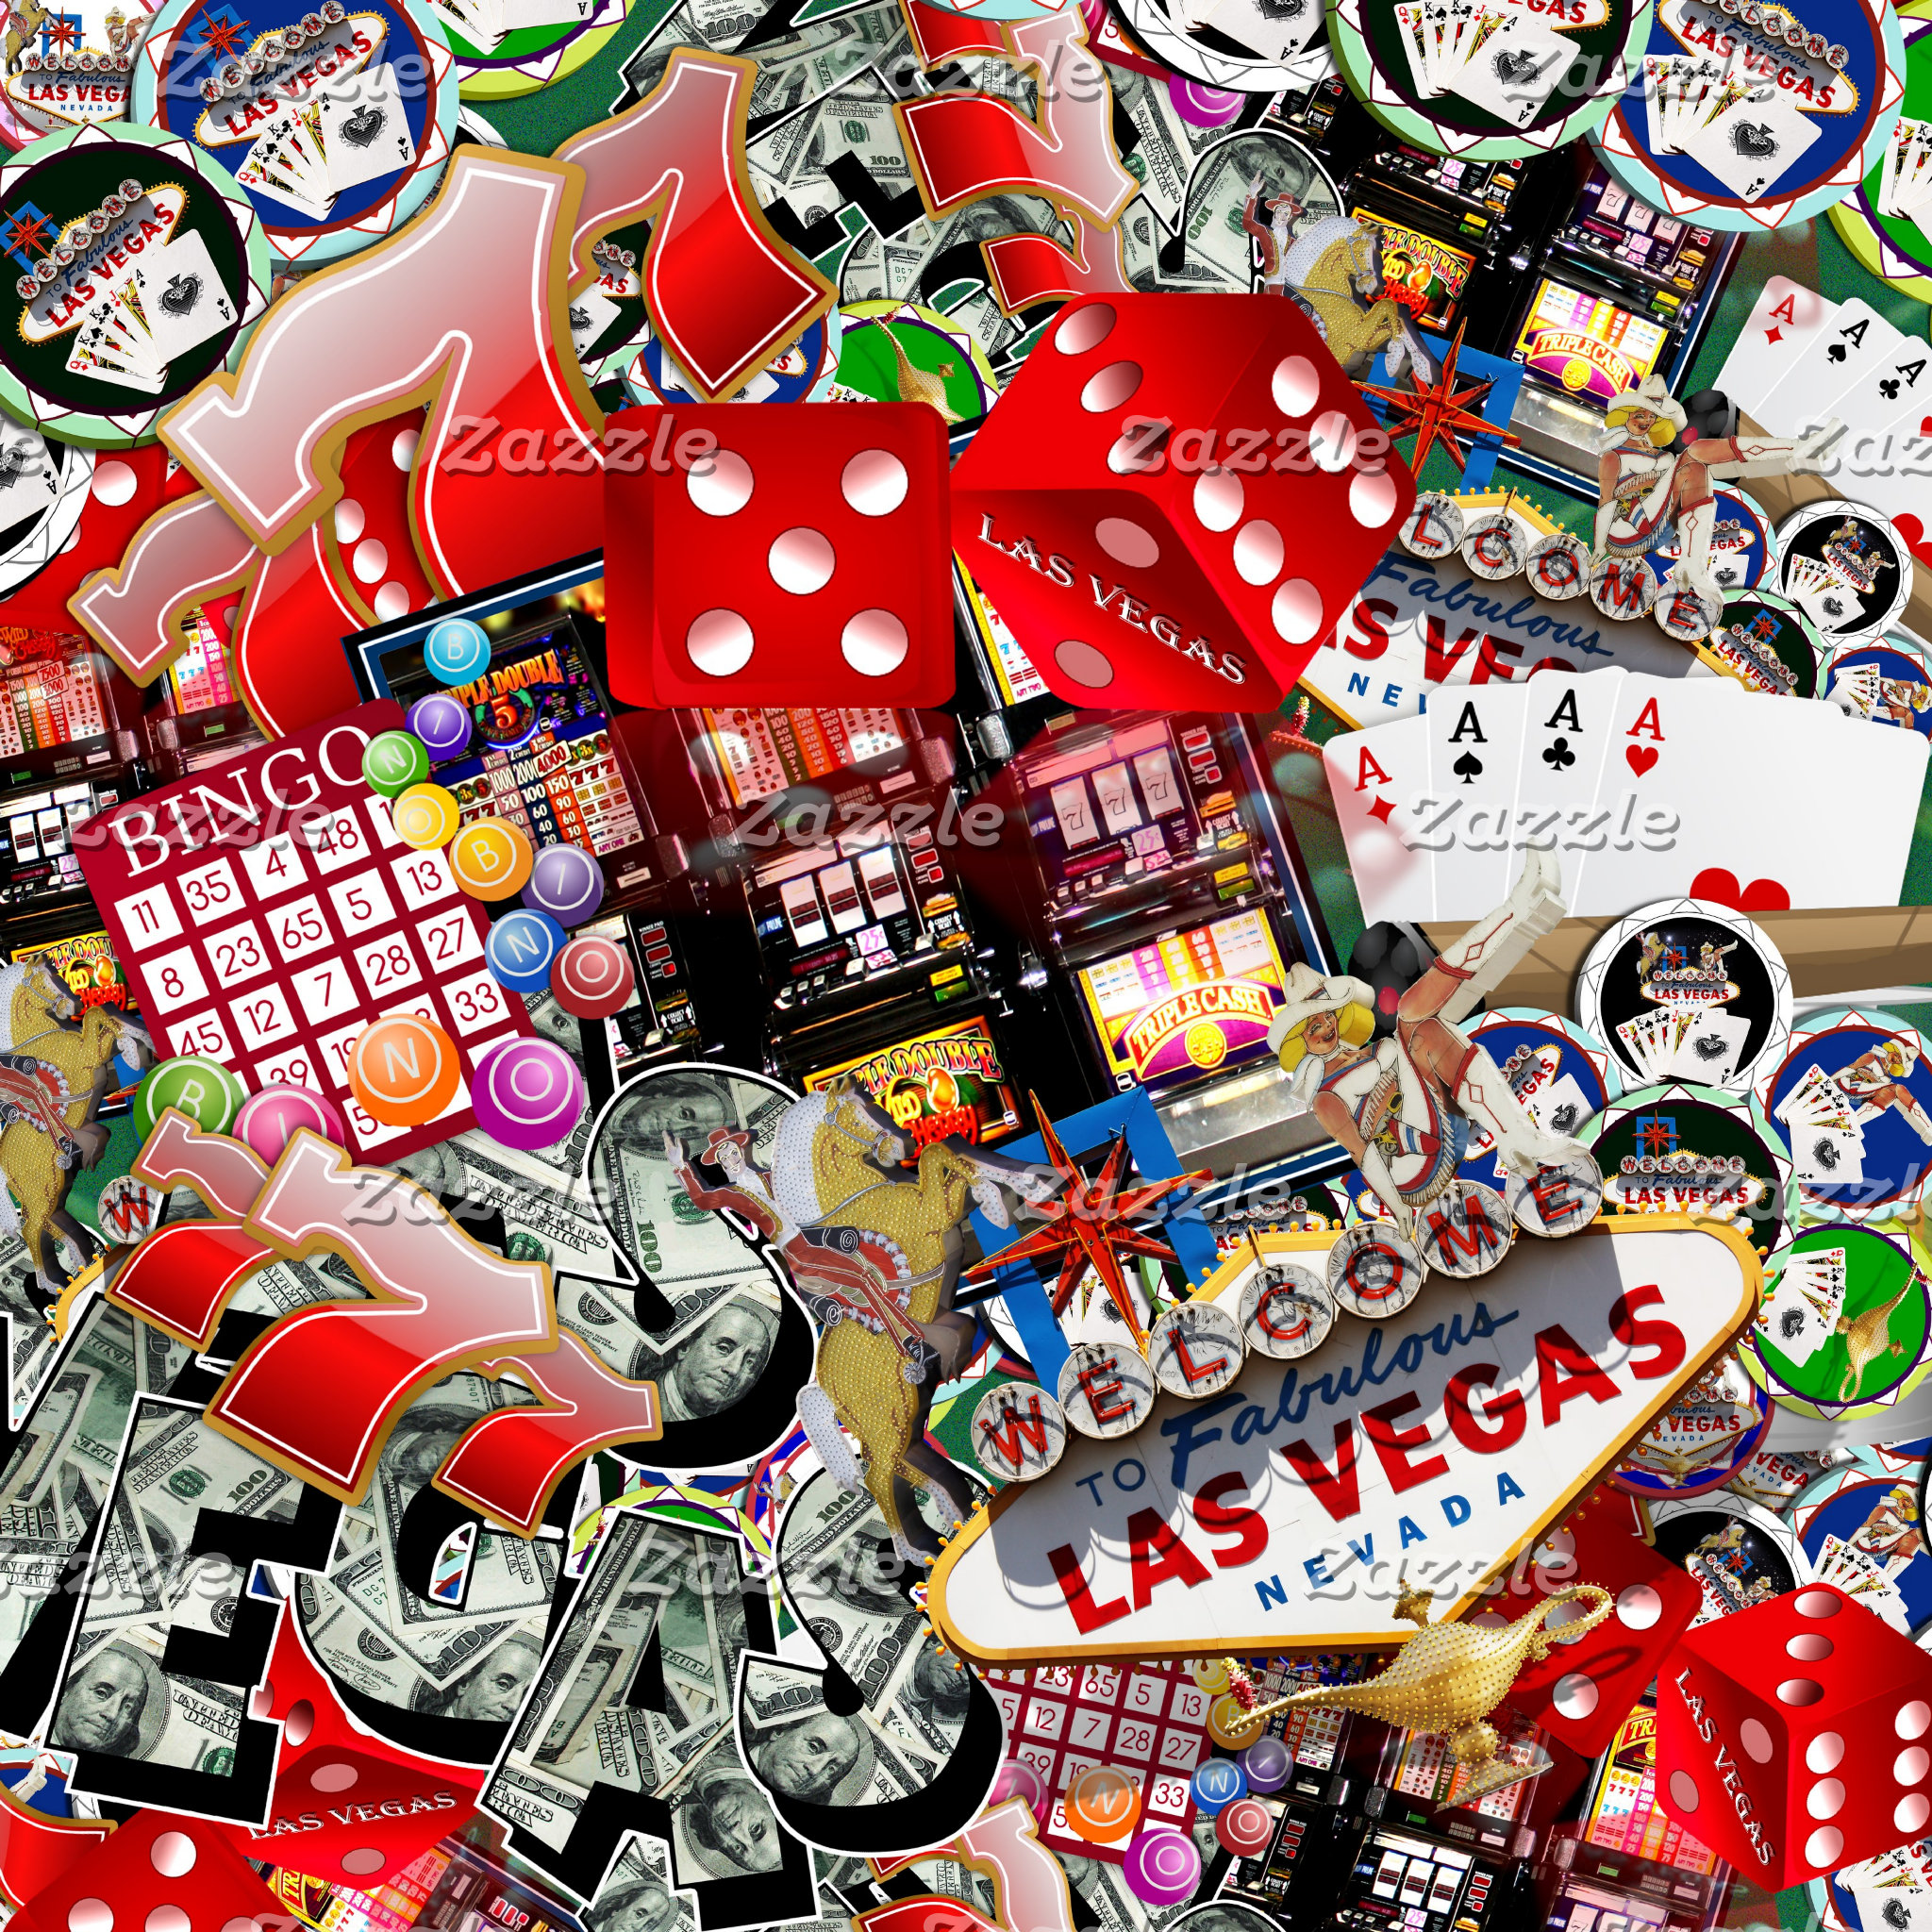 Gamblers Delite